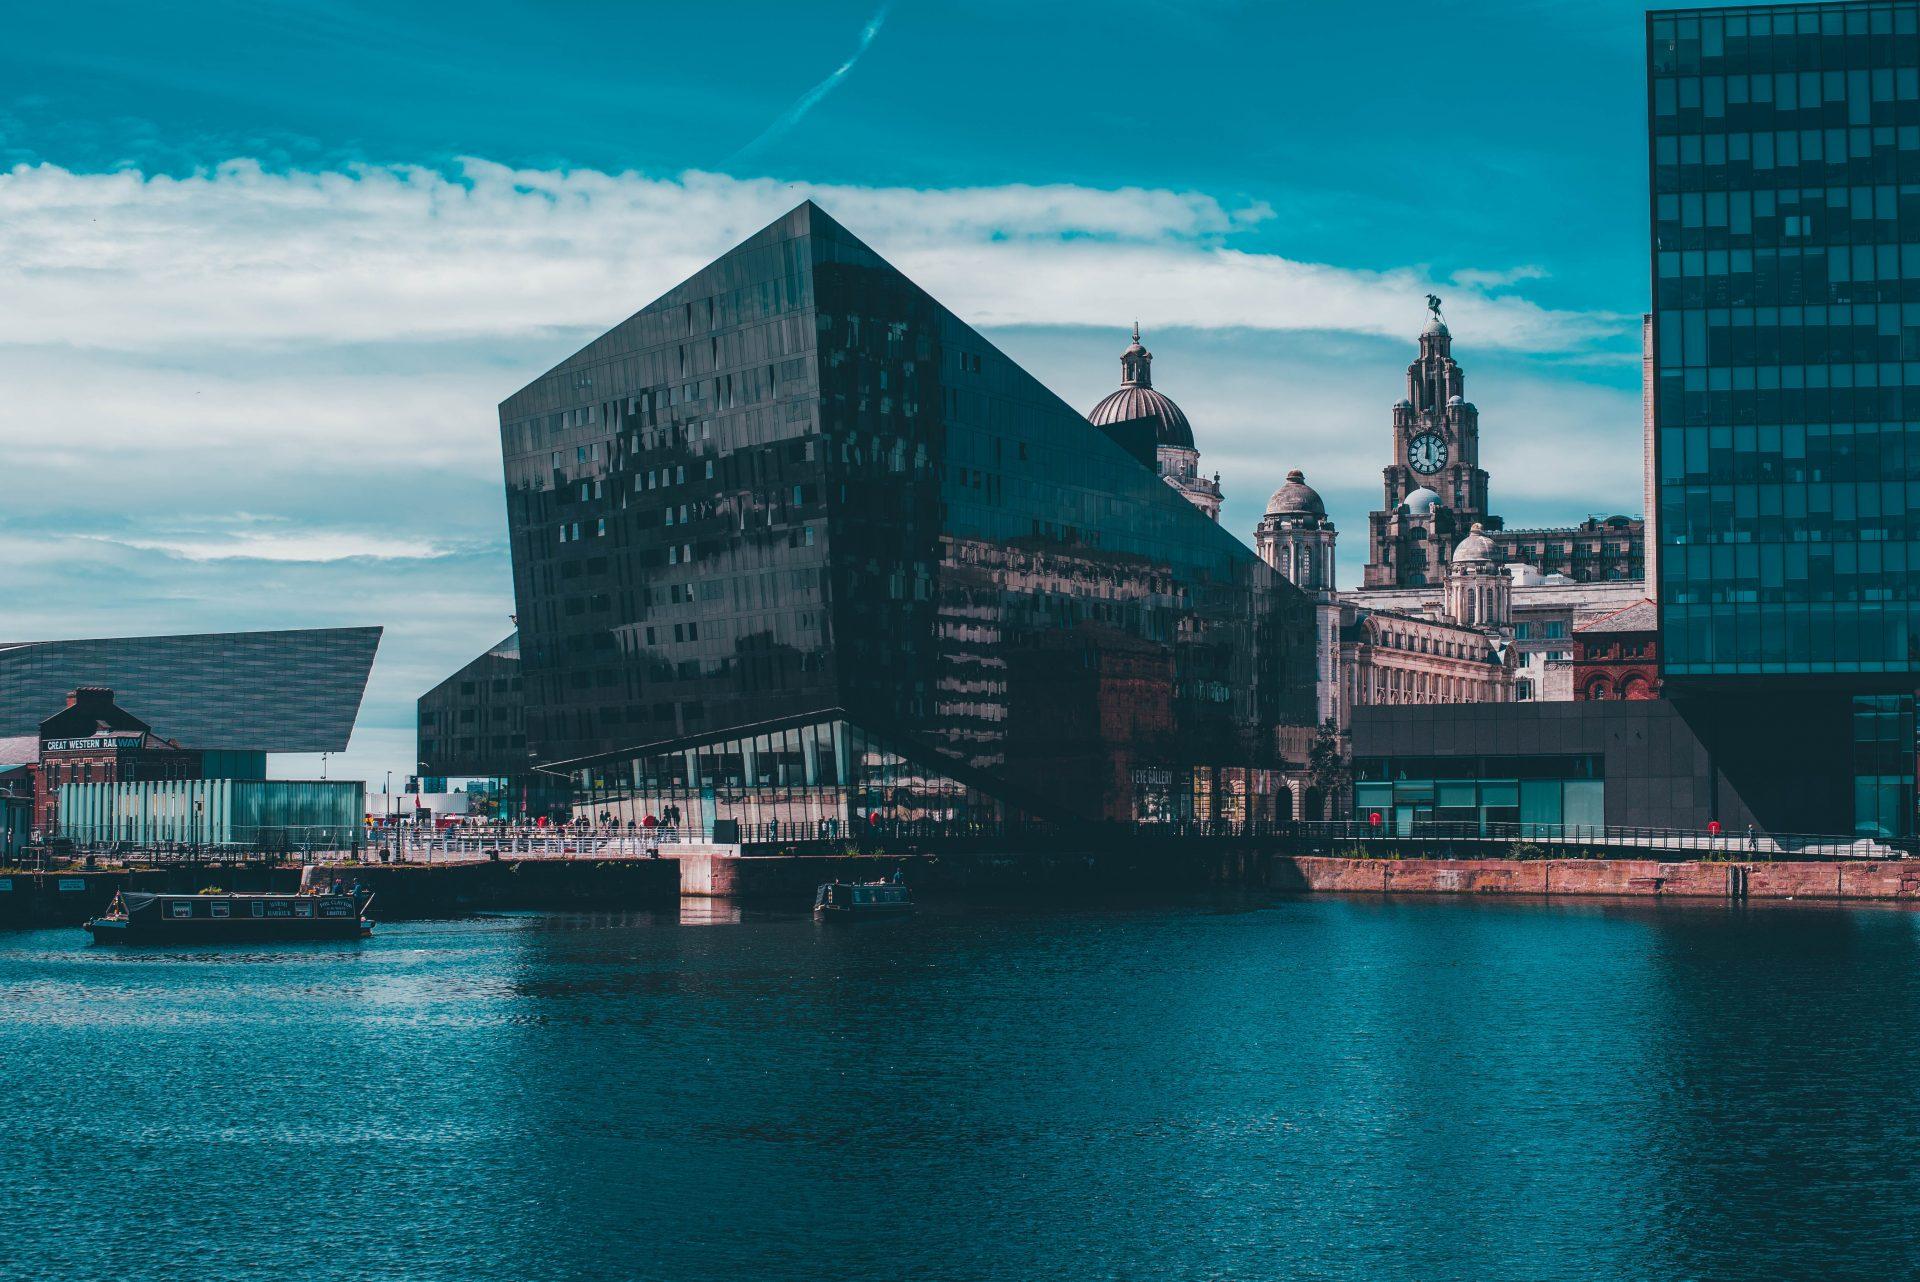 World Heritage Committee deletes Liverpool from UNESCO's World Heritage ListWorld Heritage Committee deletes Liverpool from UNESCO's World Heritage List